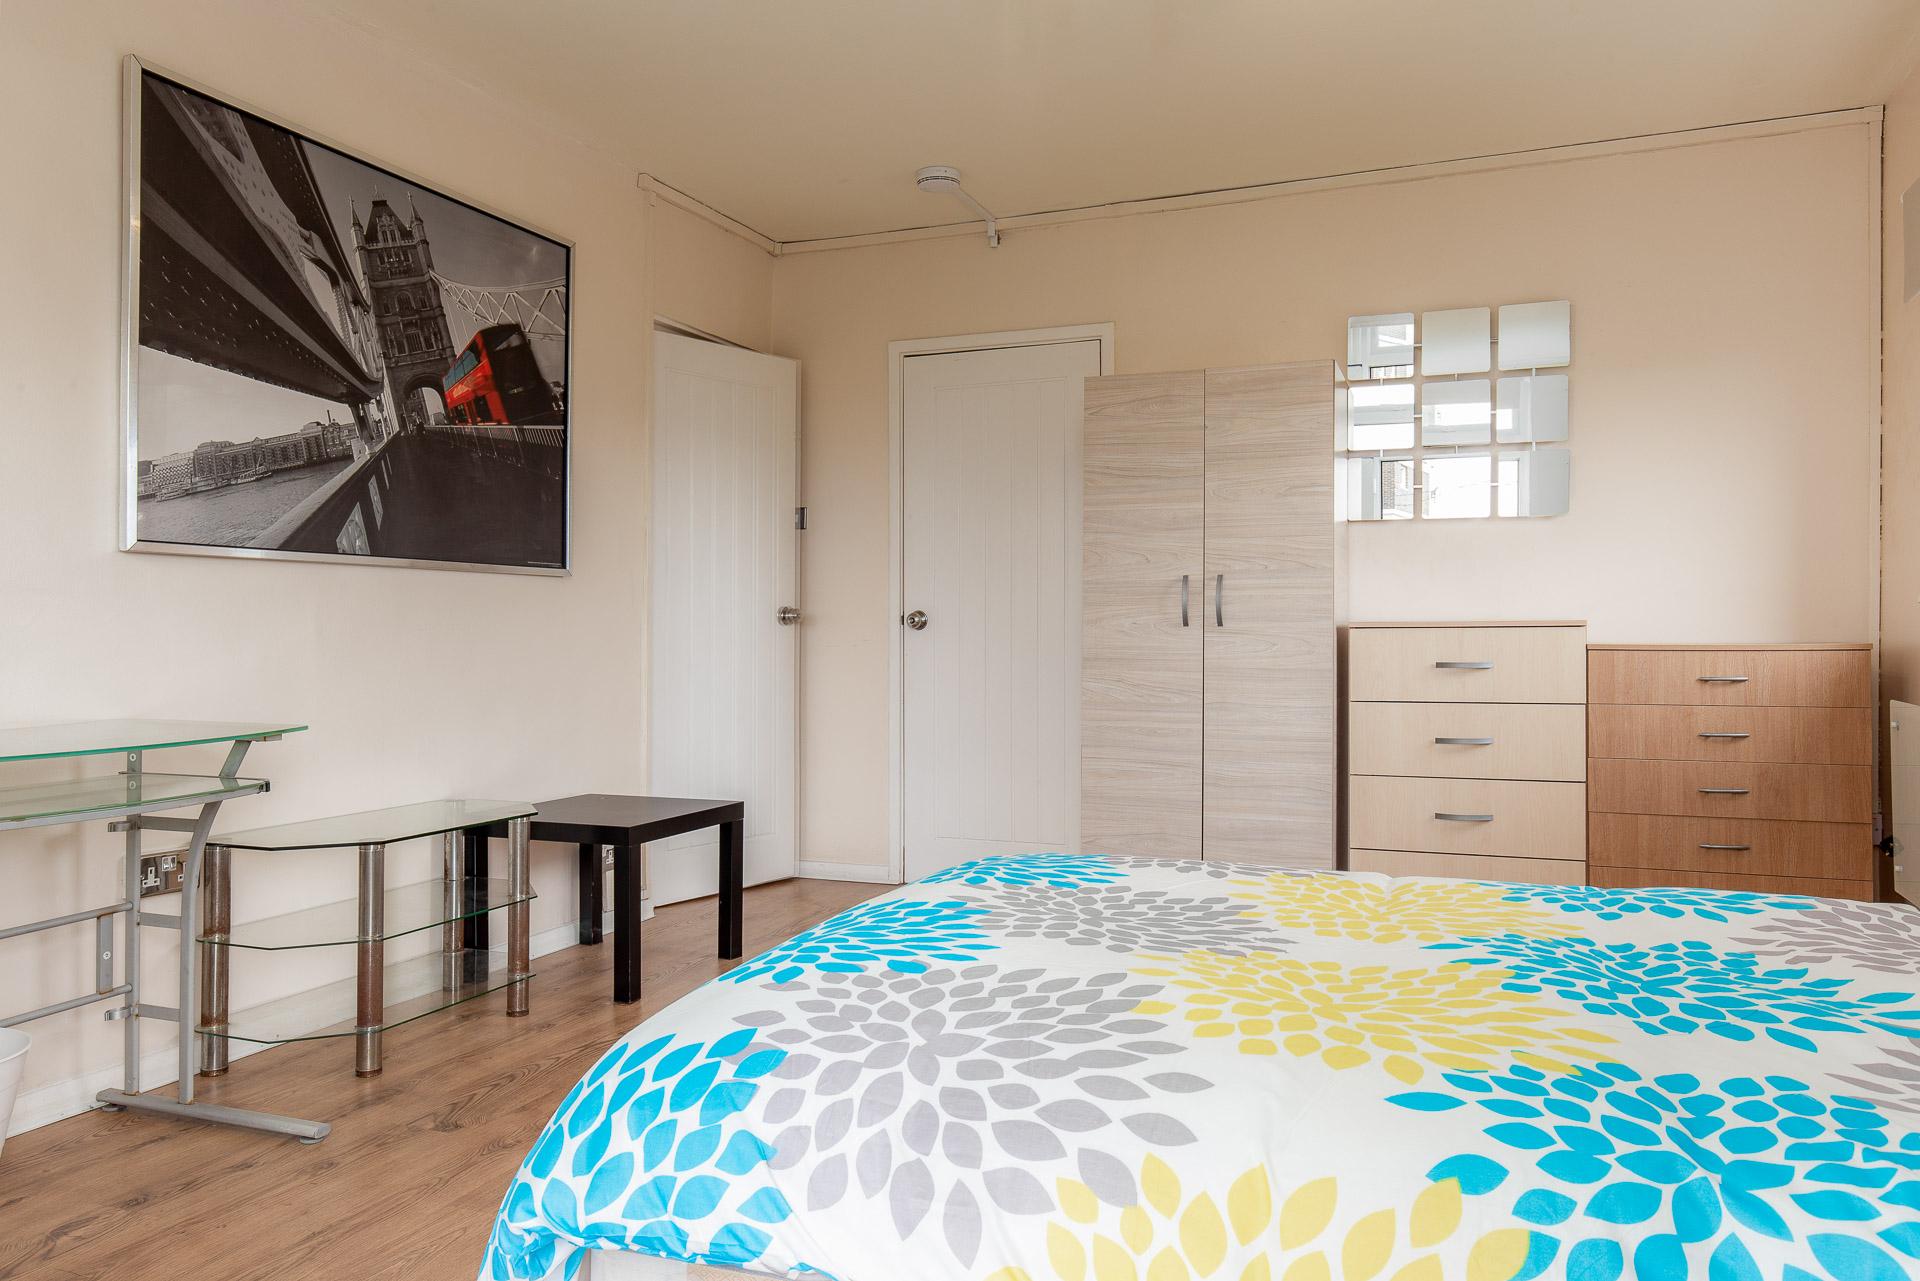 Queensland House London Deluxe Guest Room 3 photo 20449780